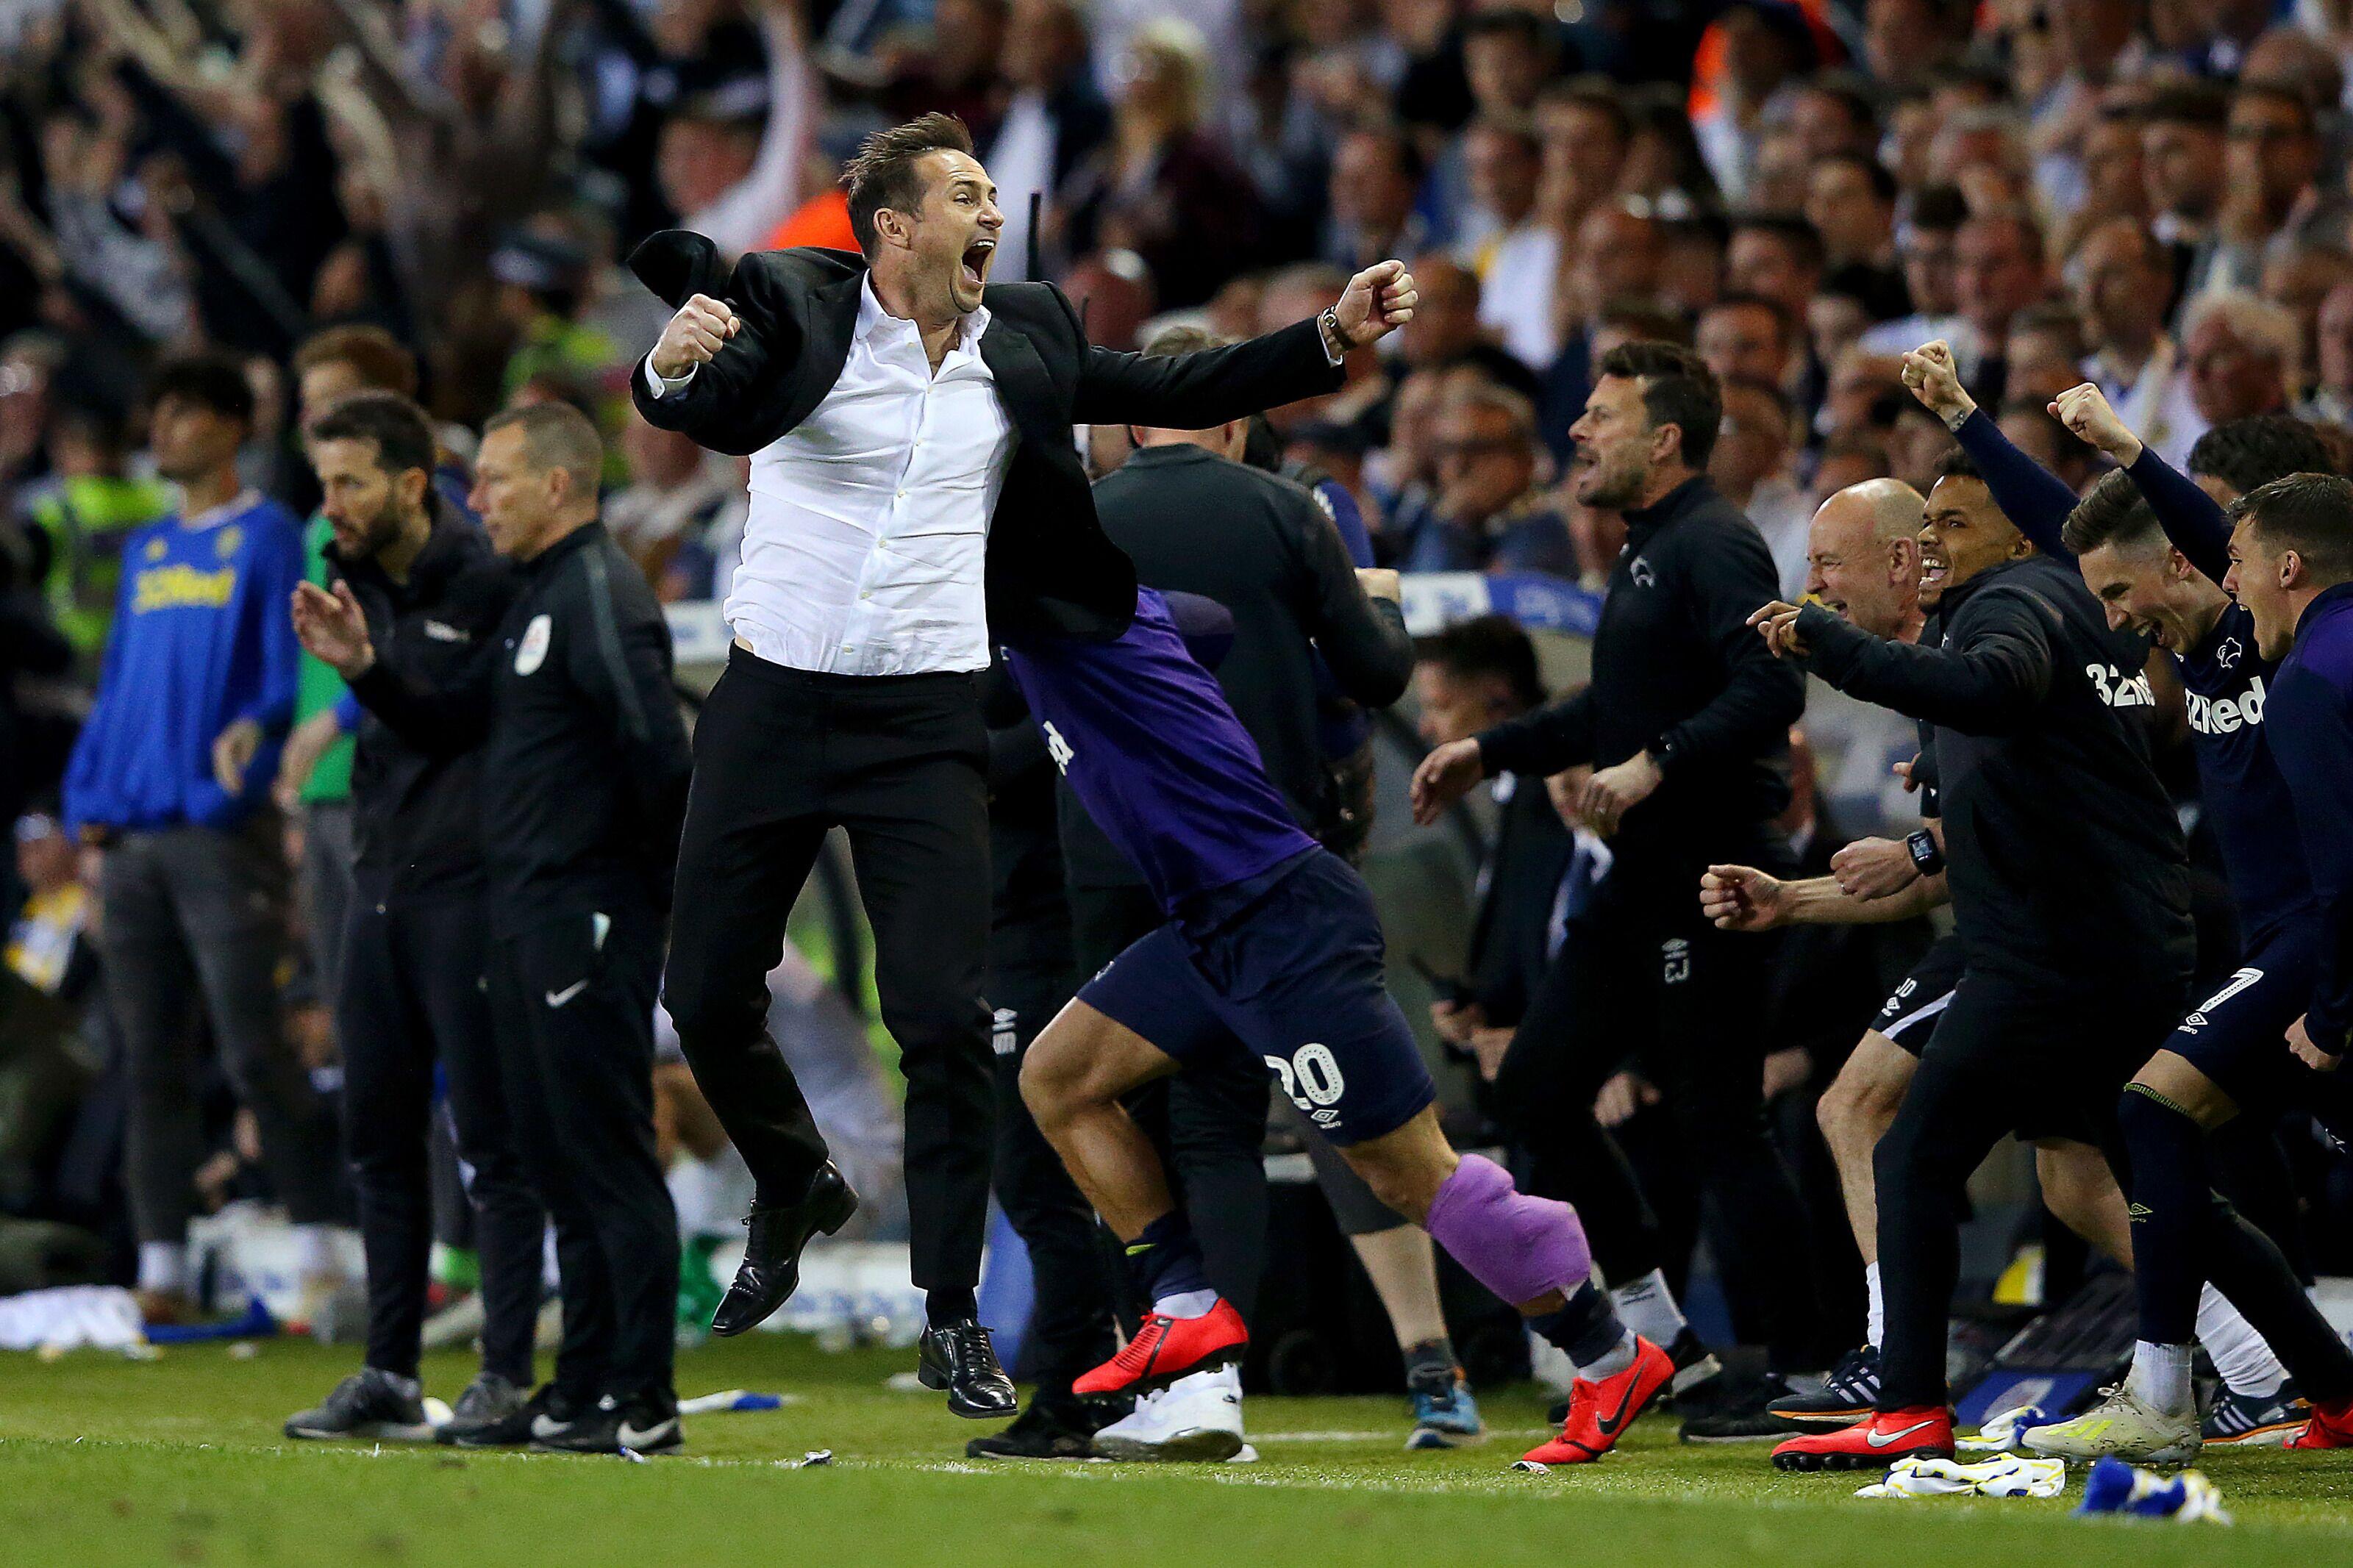 Chelsea: Jurgen Klopp forgets that Frank Lampard is not Maurizio Sarri